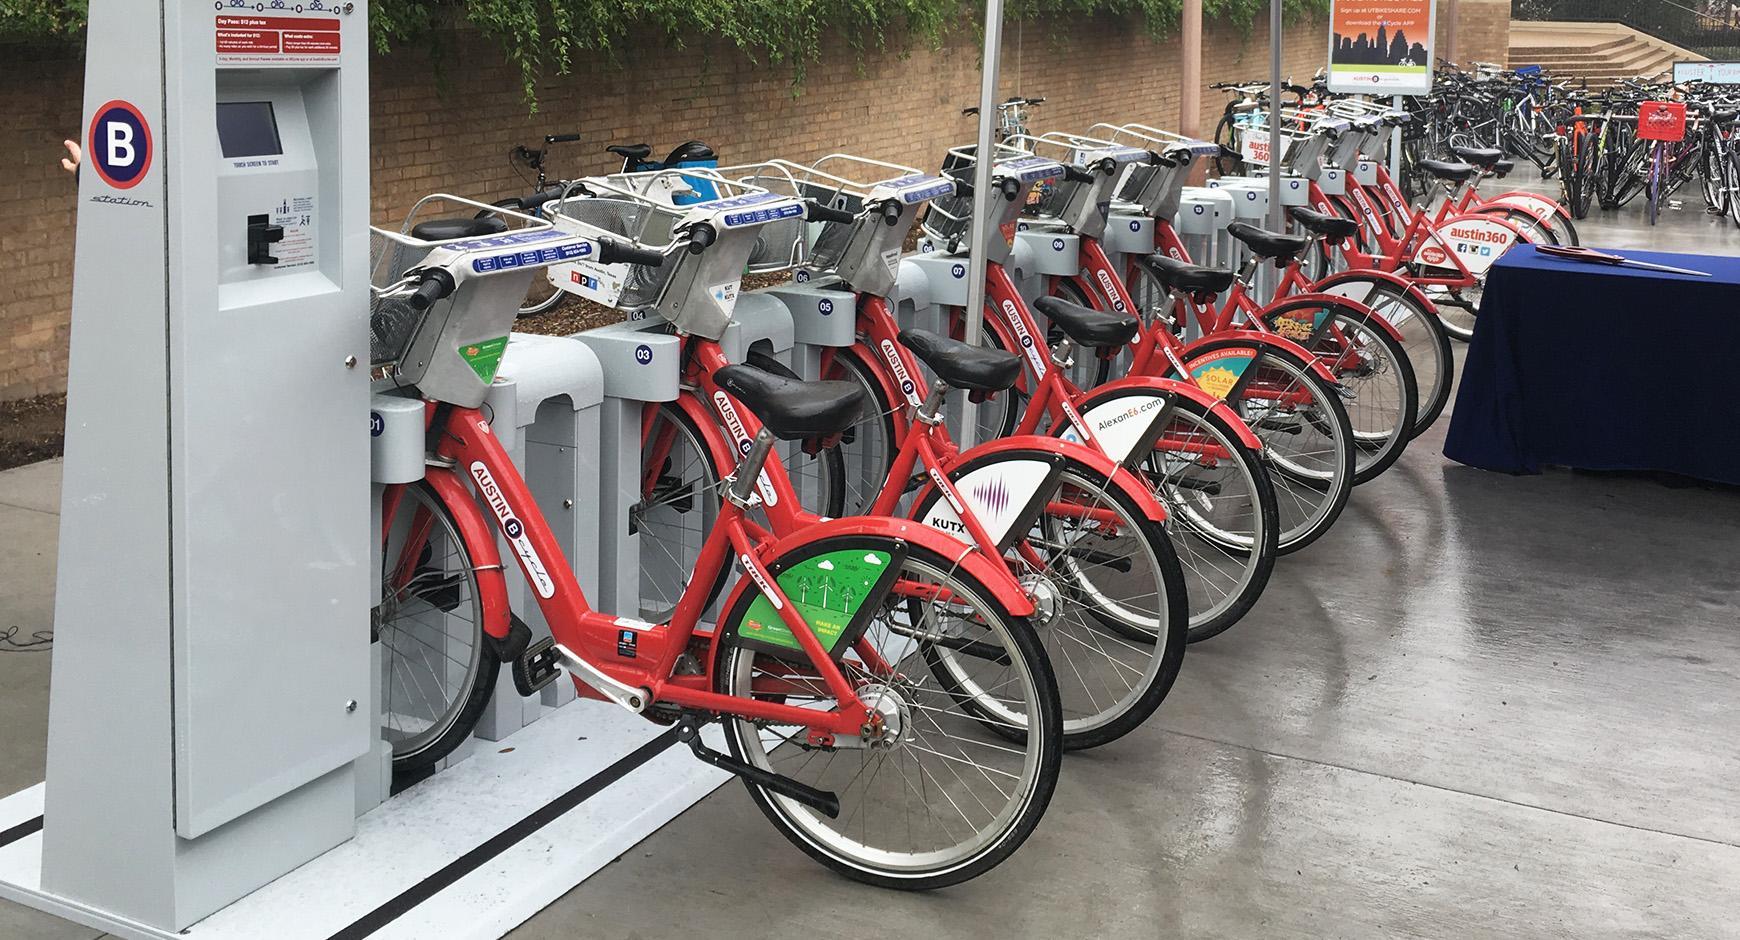 Bike sharing on campus